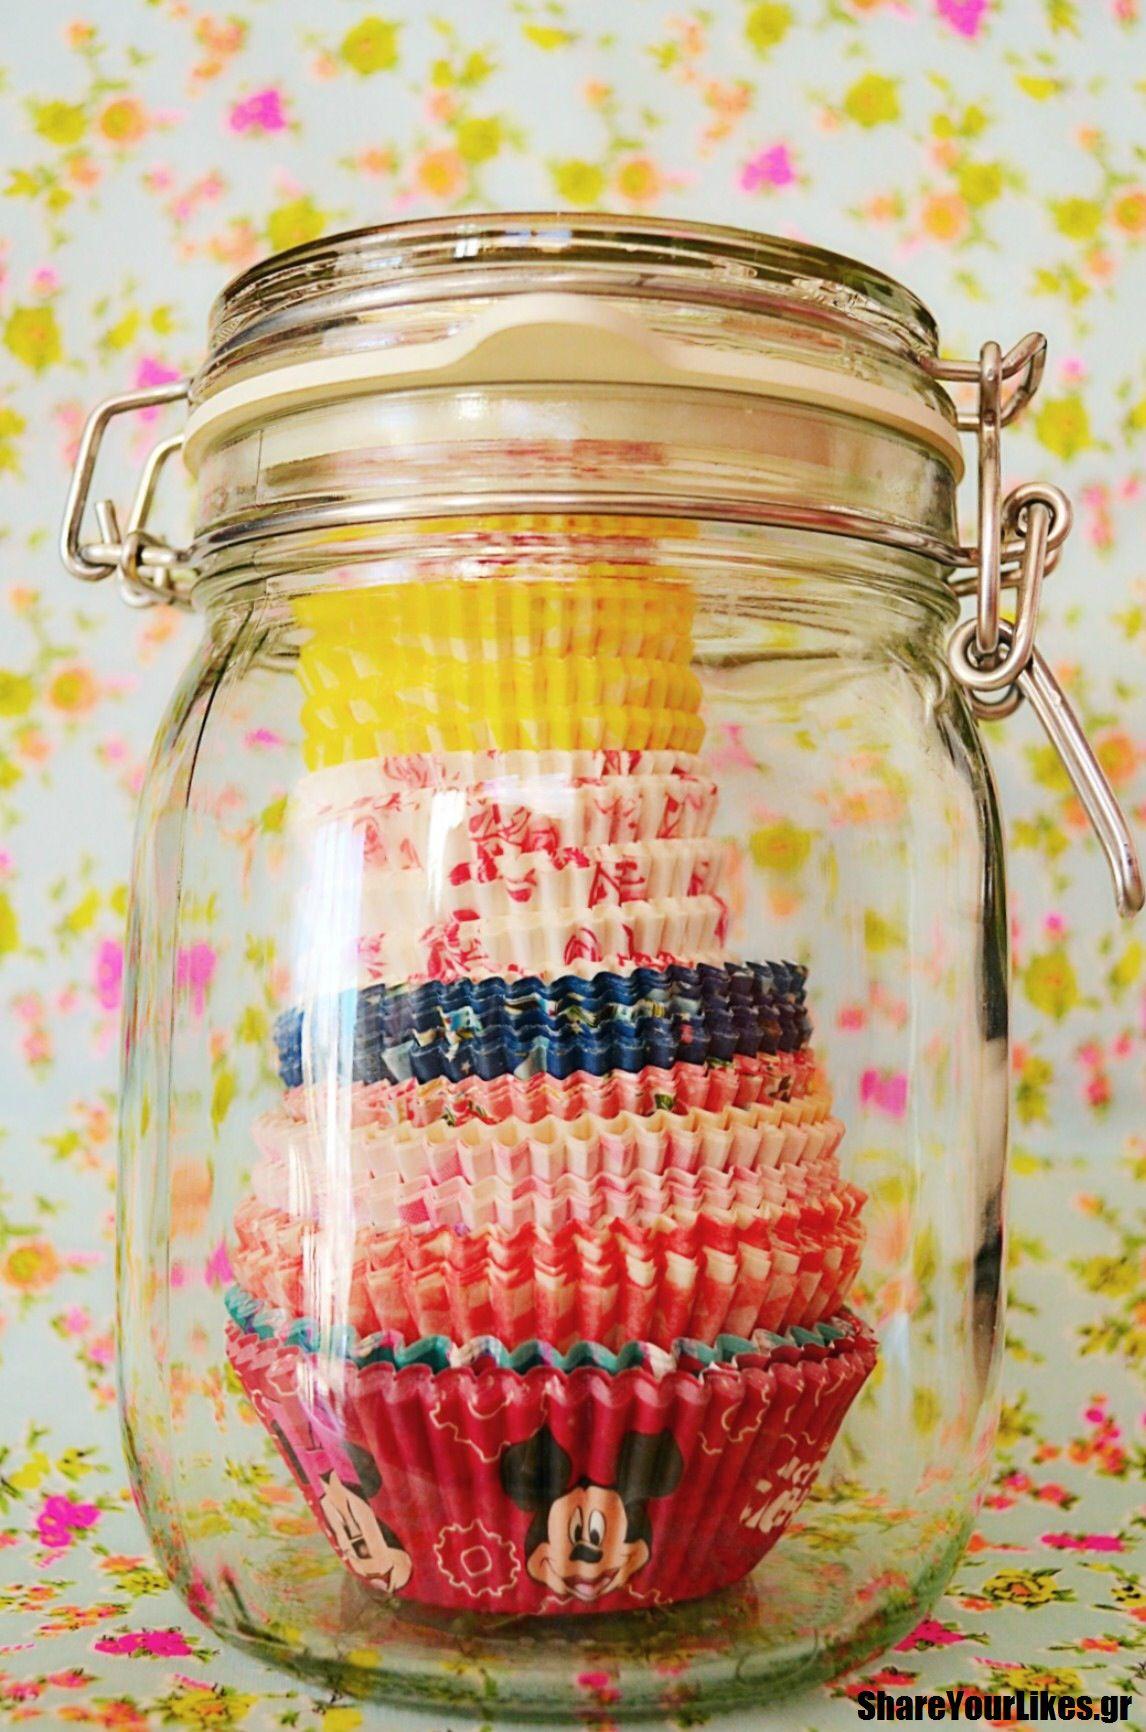 tips organwsis_thikes cupcakes